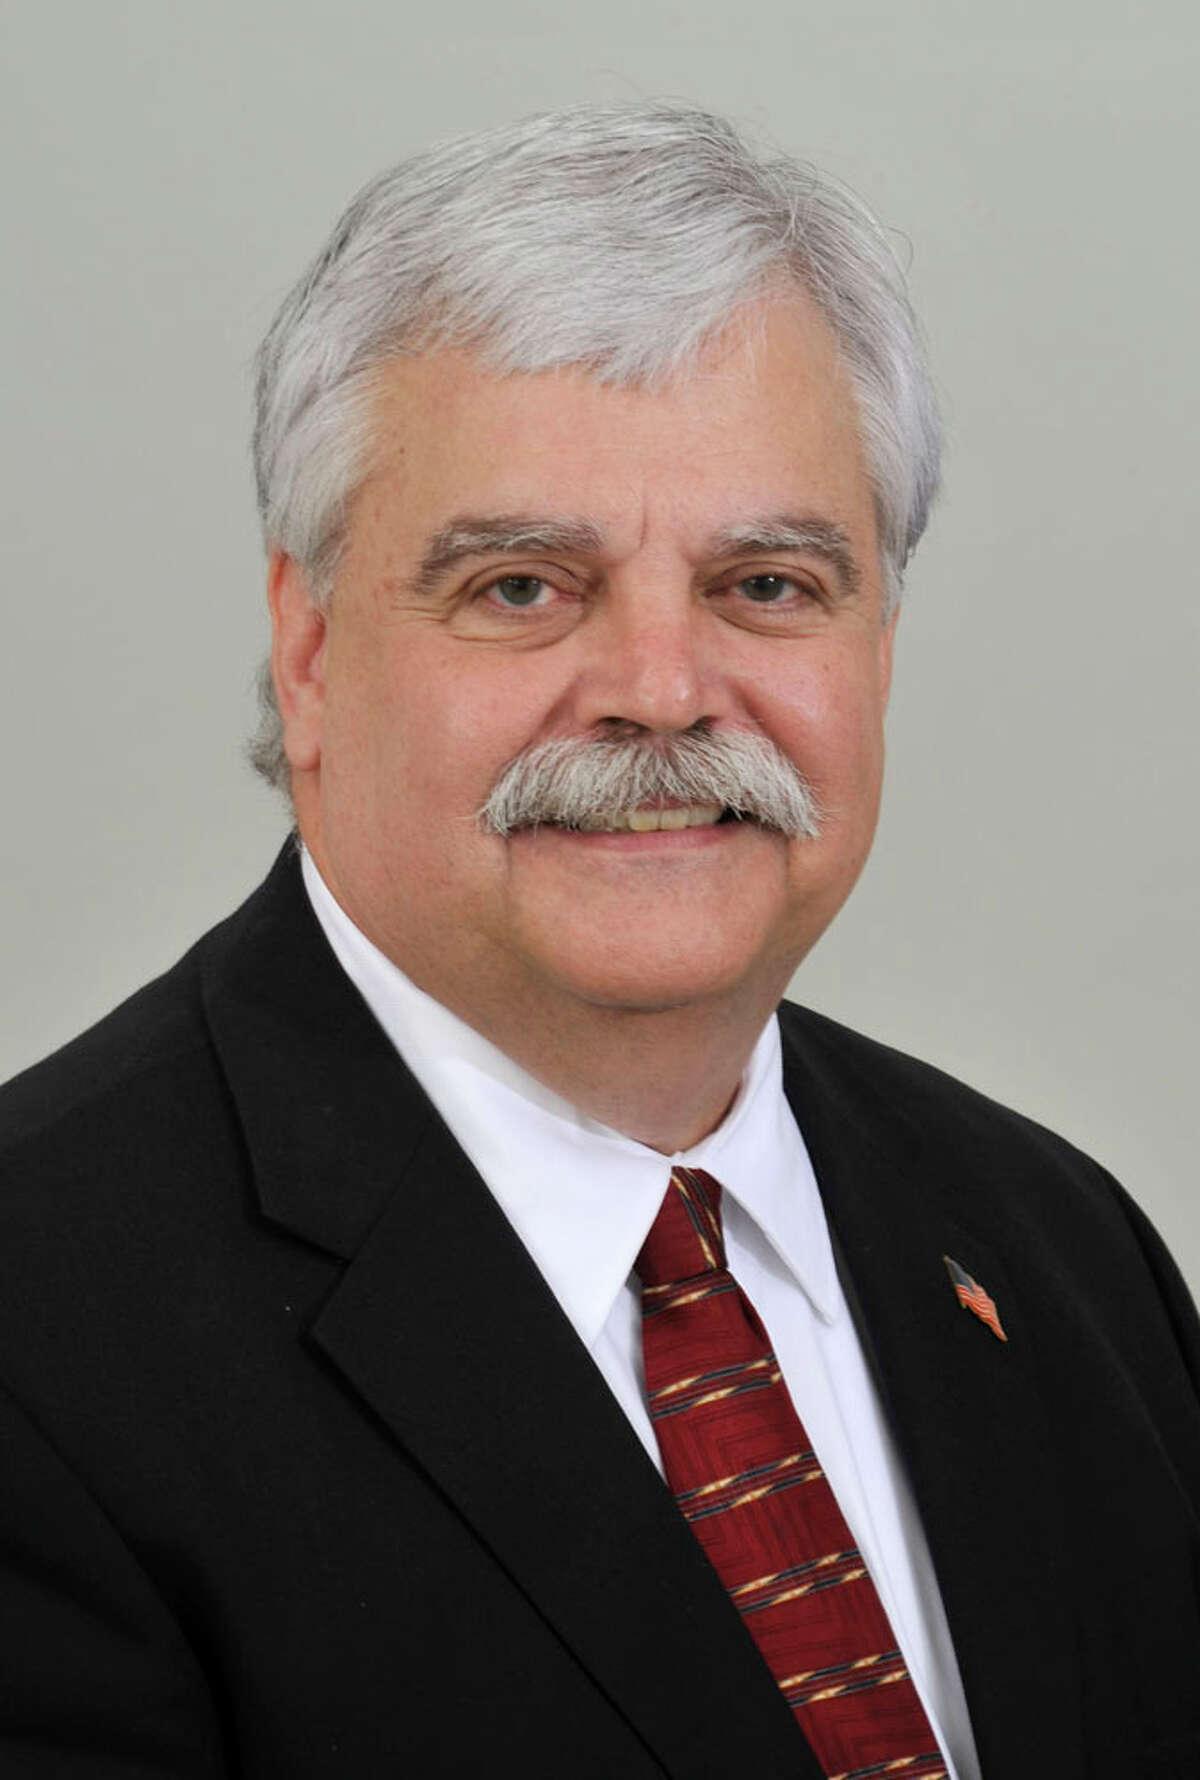 State Rep. Robert Godfrey, Democratic incumbent in the 110th District.